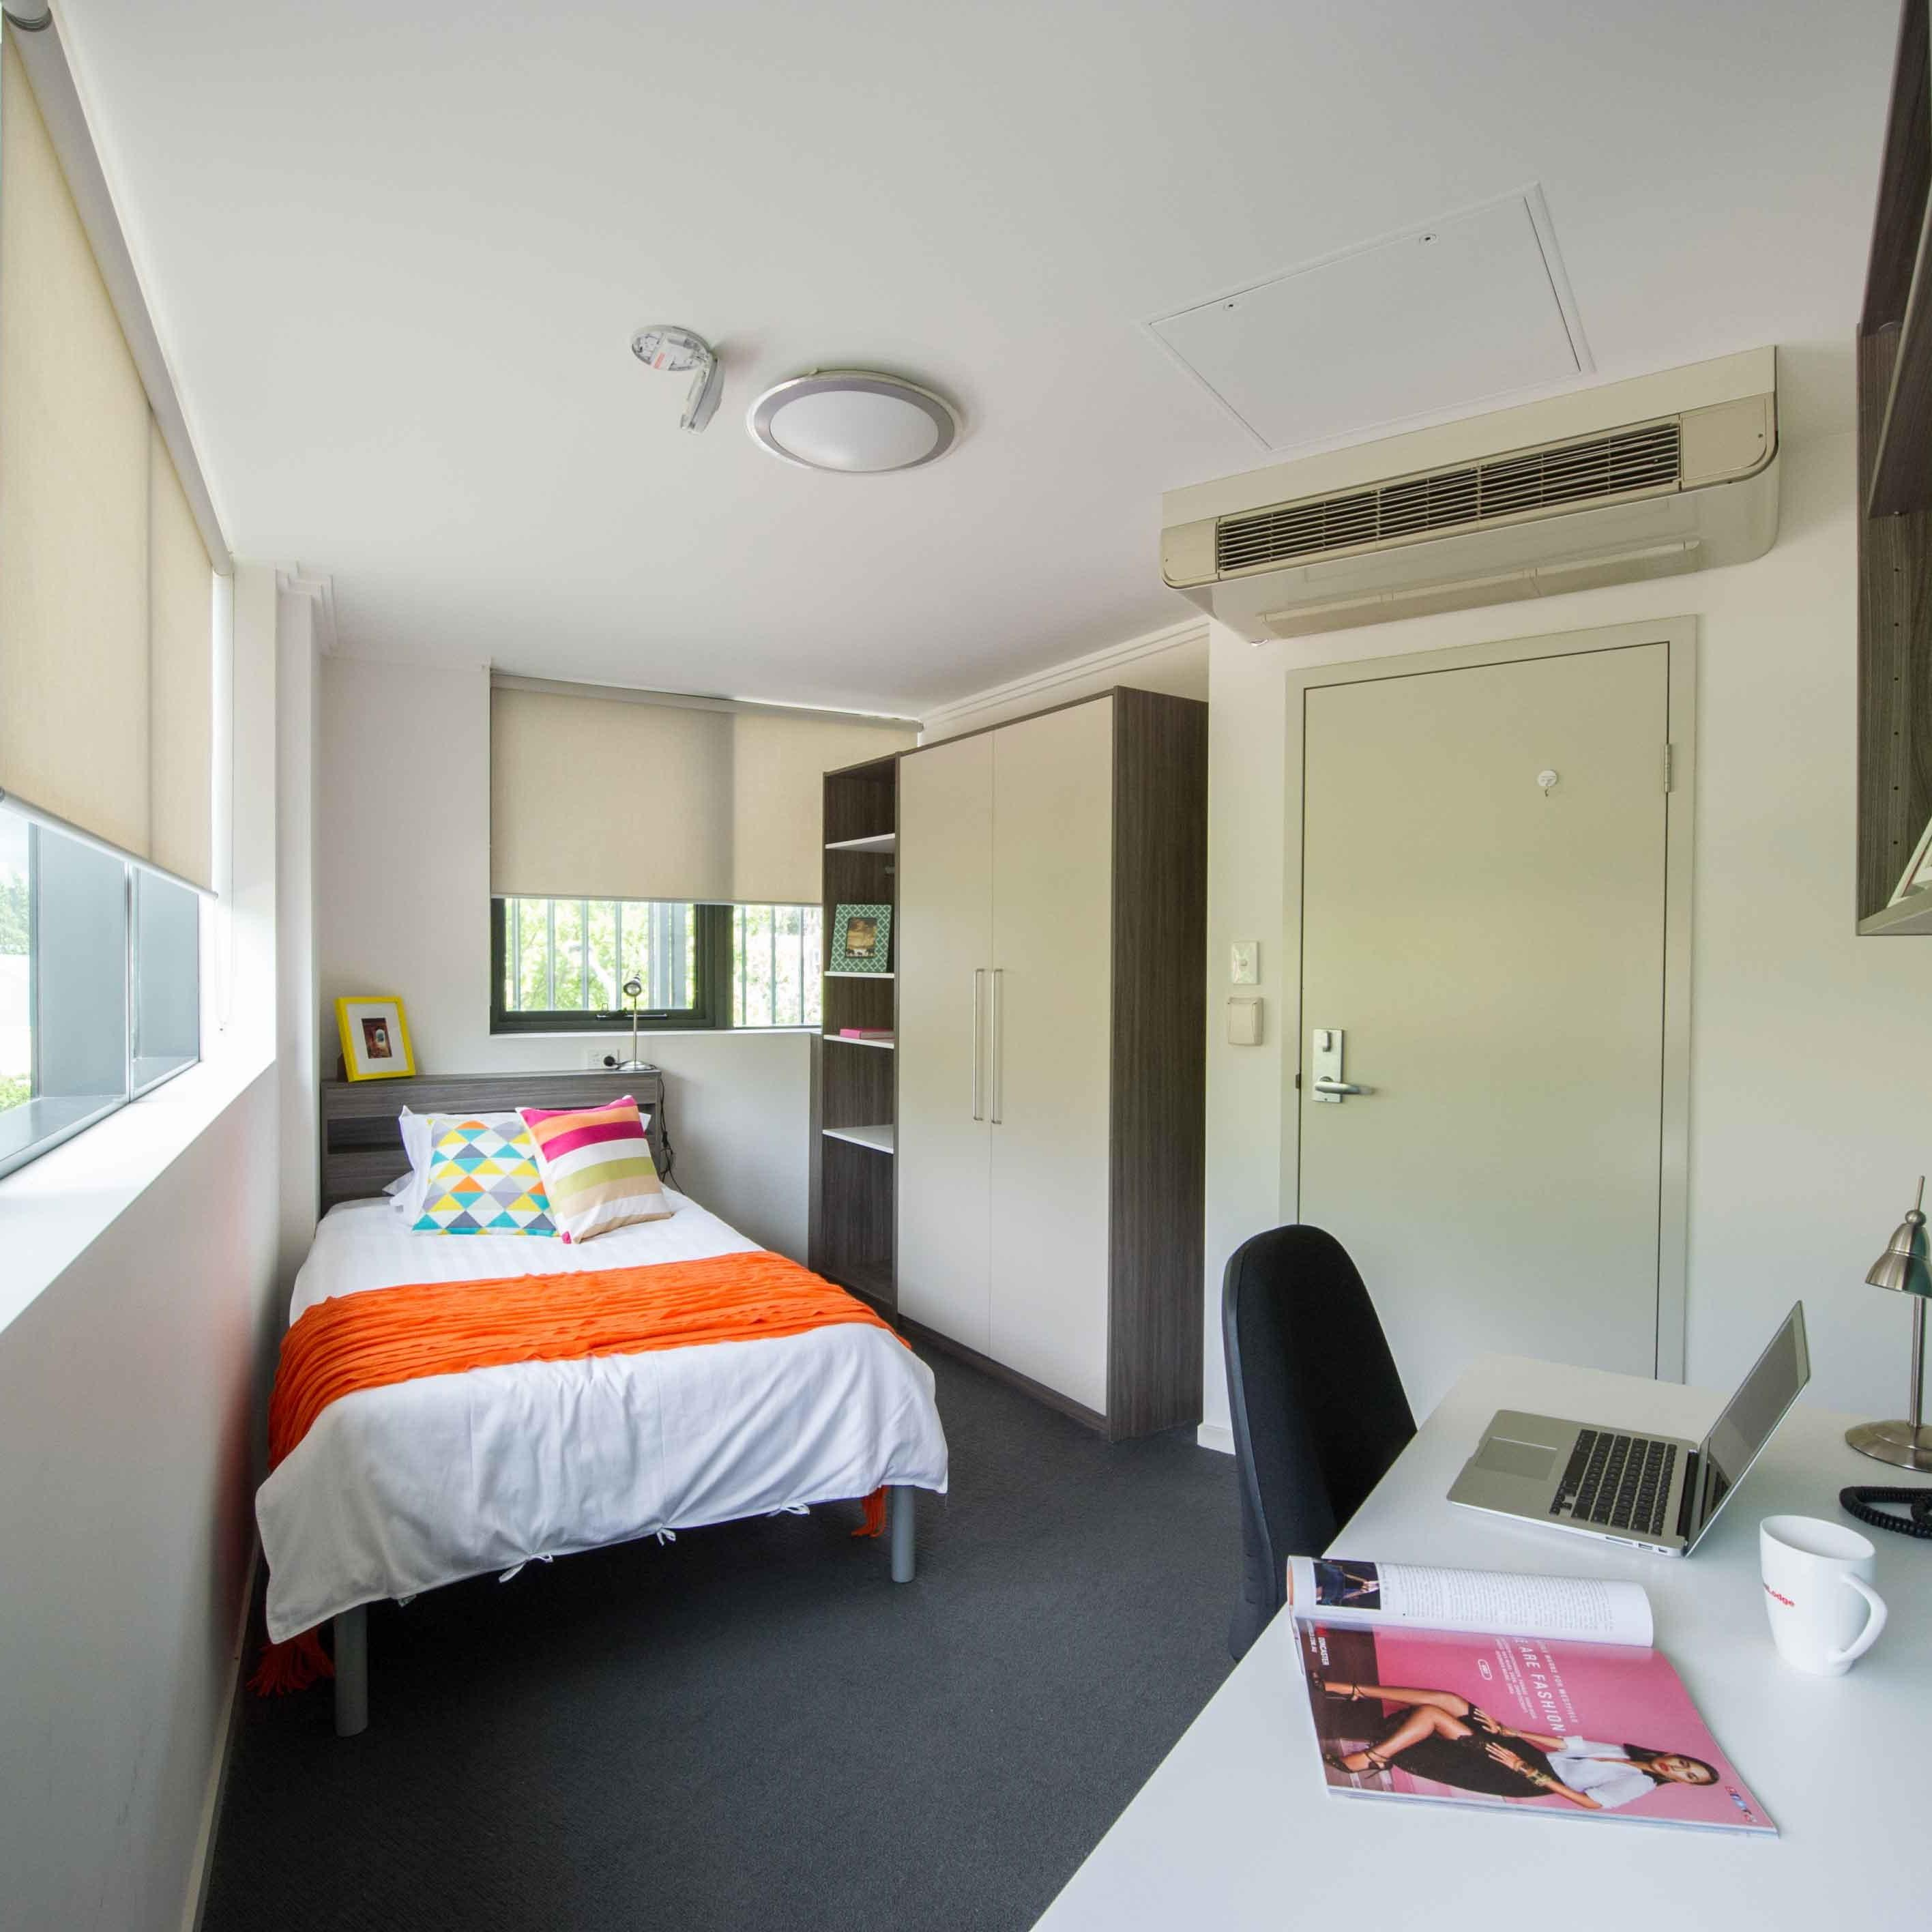 UniLodge @ ANU Warrambul Lodge 6 Bedroom Apartment